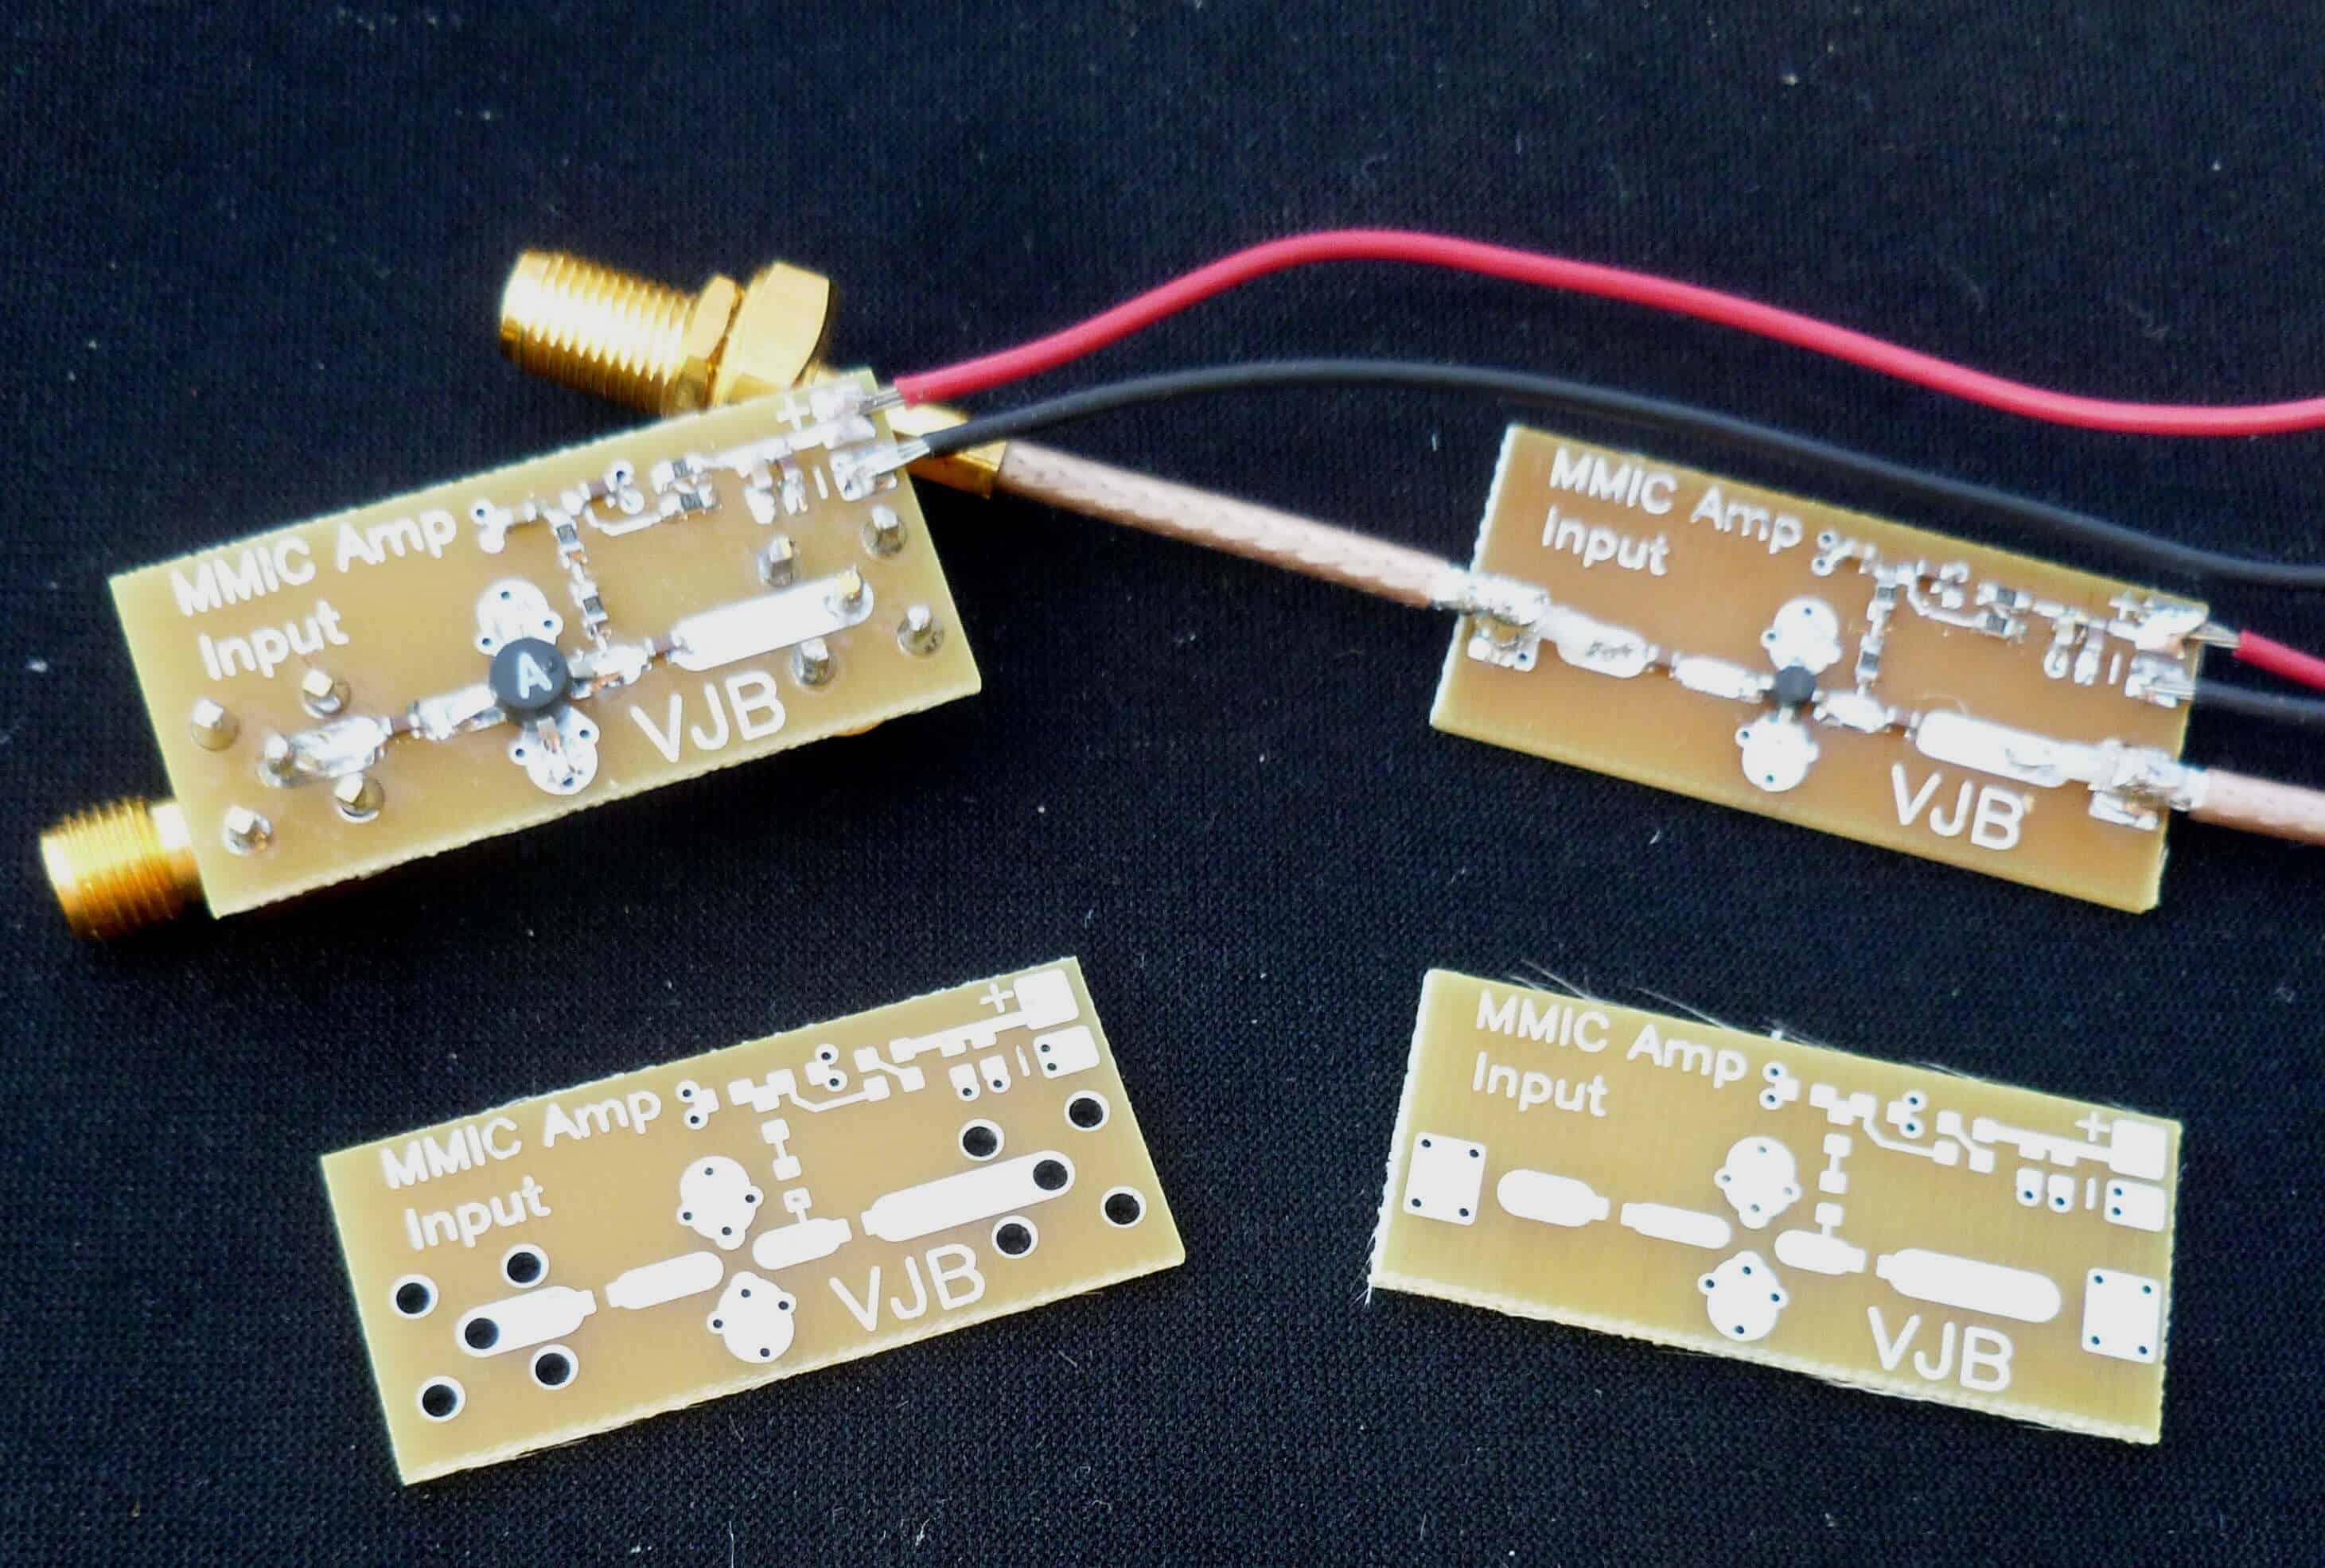 Generic MMIC Antenna PCB